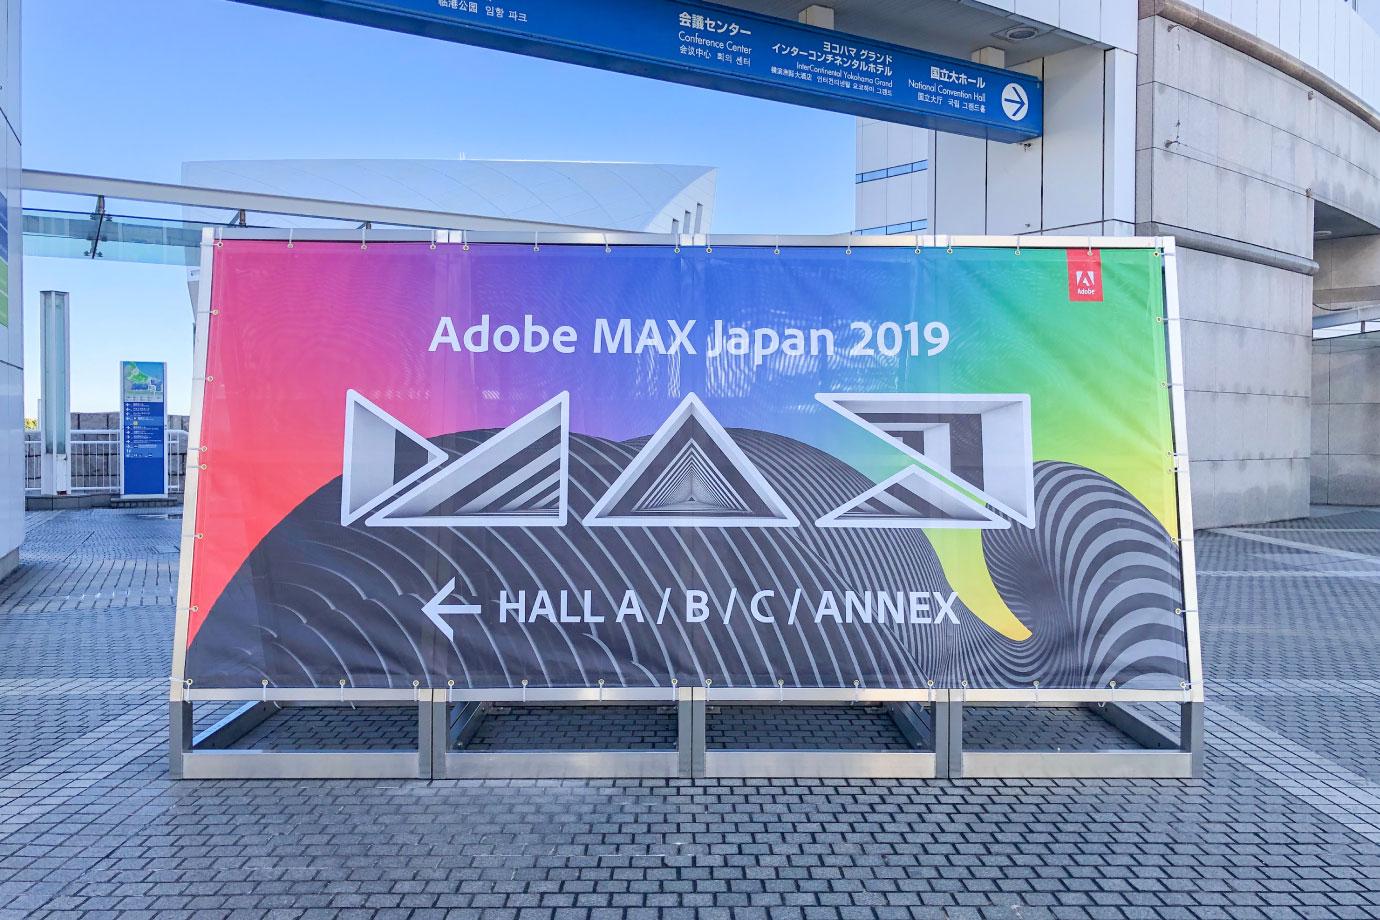 『Adobe MAX JAPAN 2019』にデザインチームが参加しました